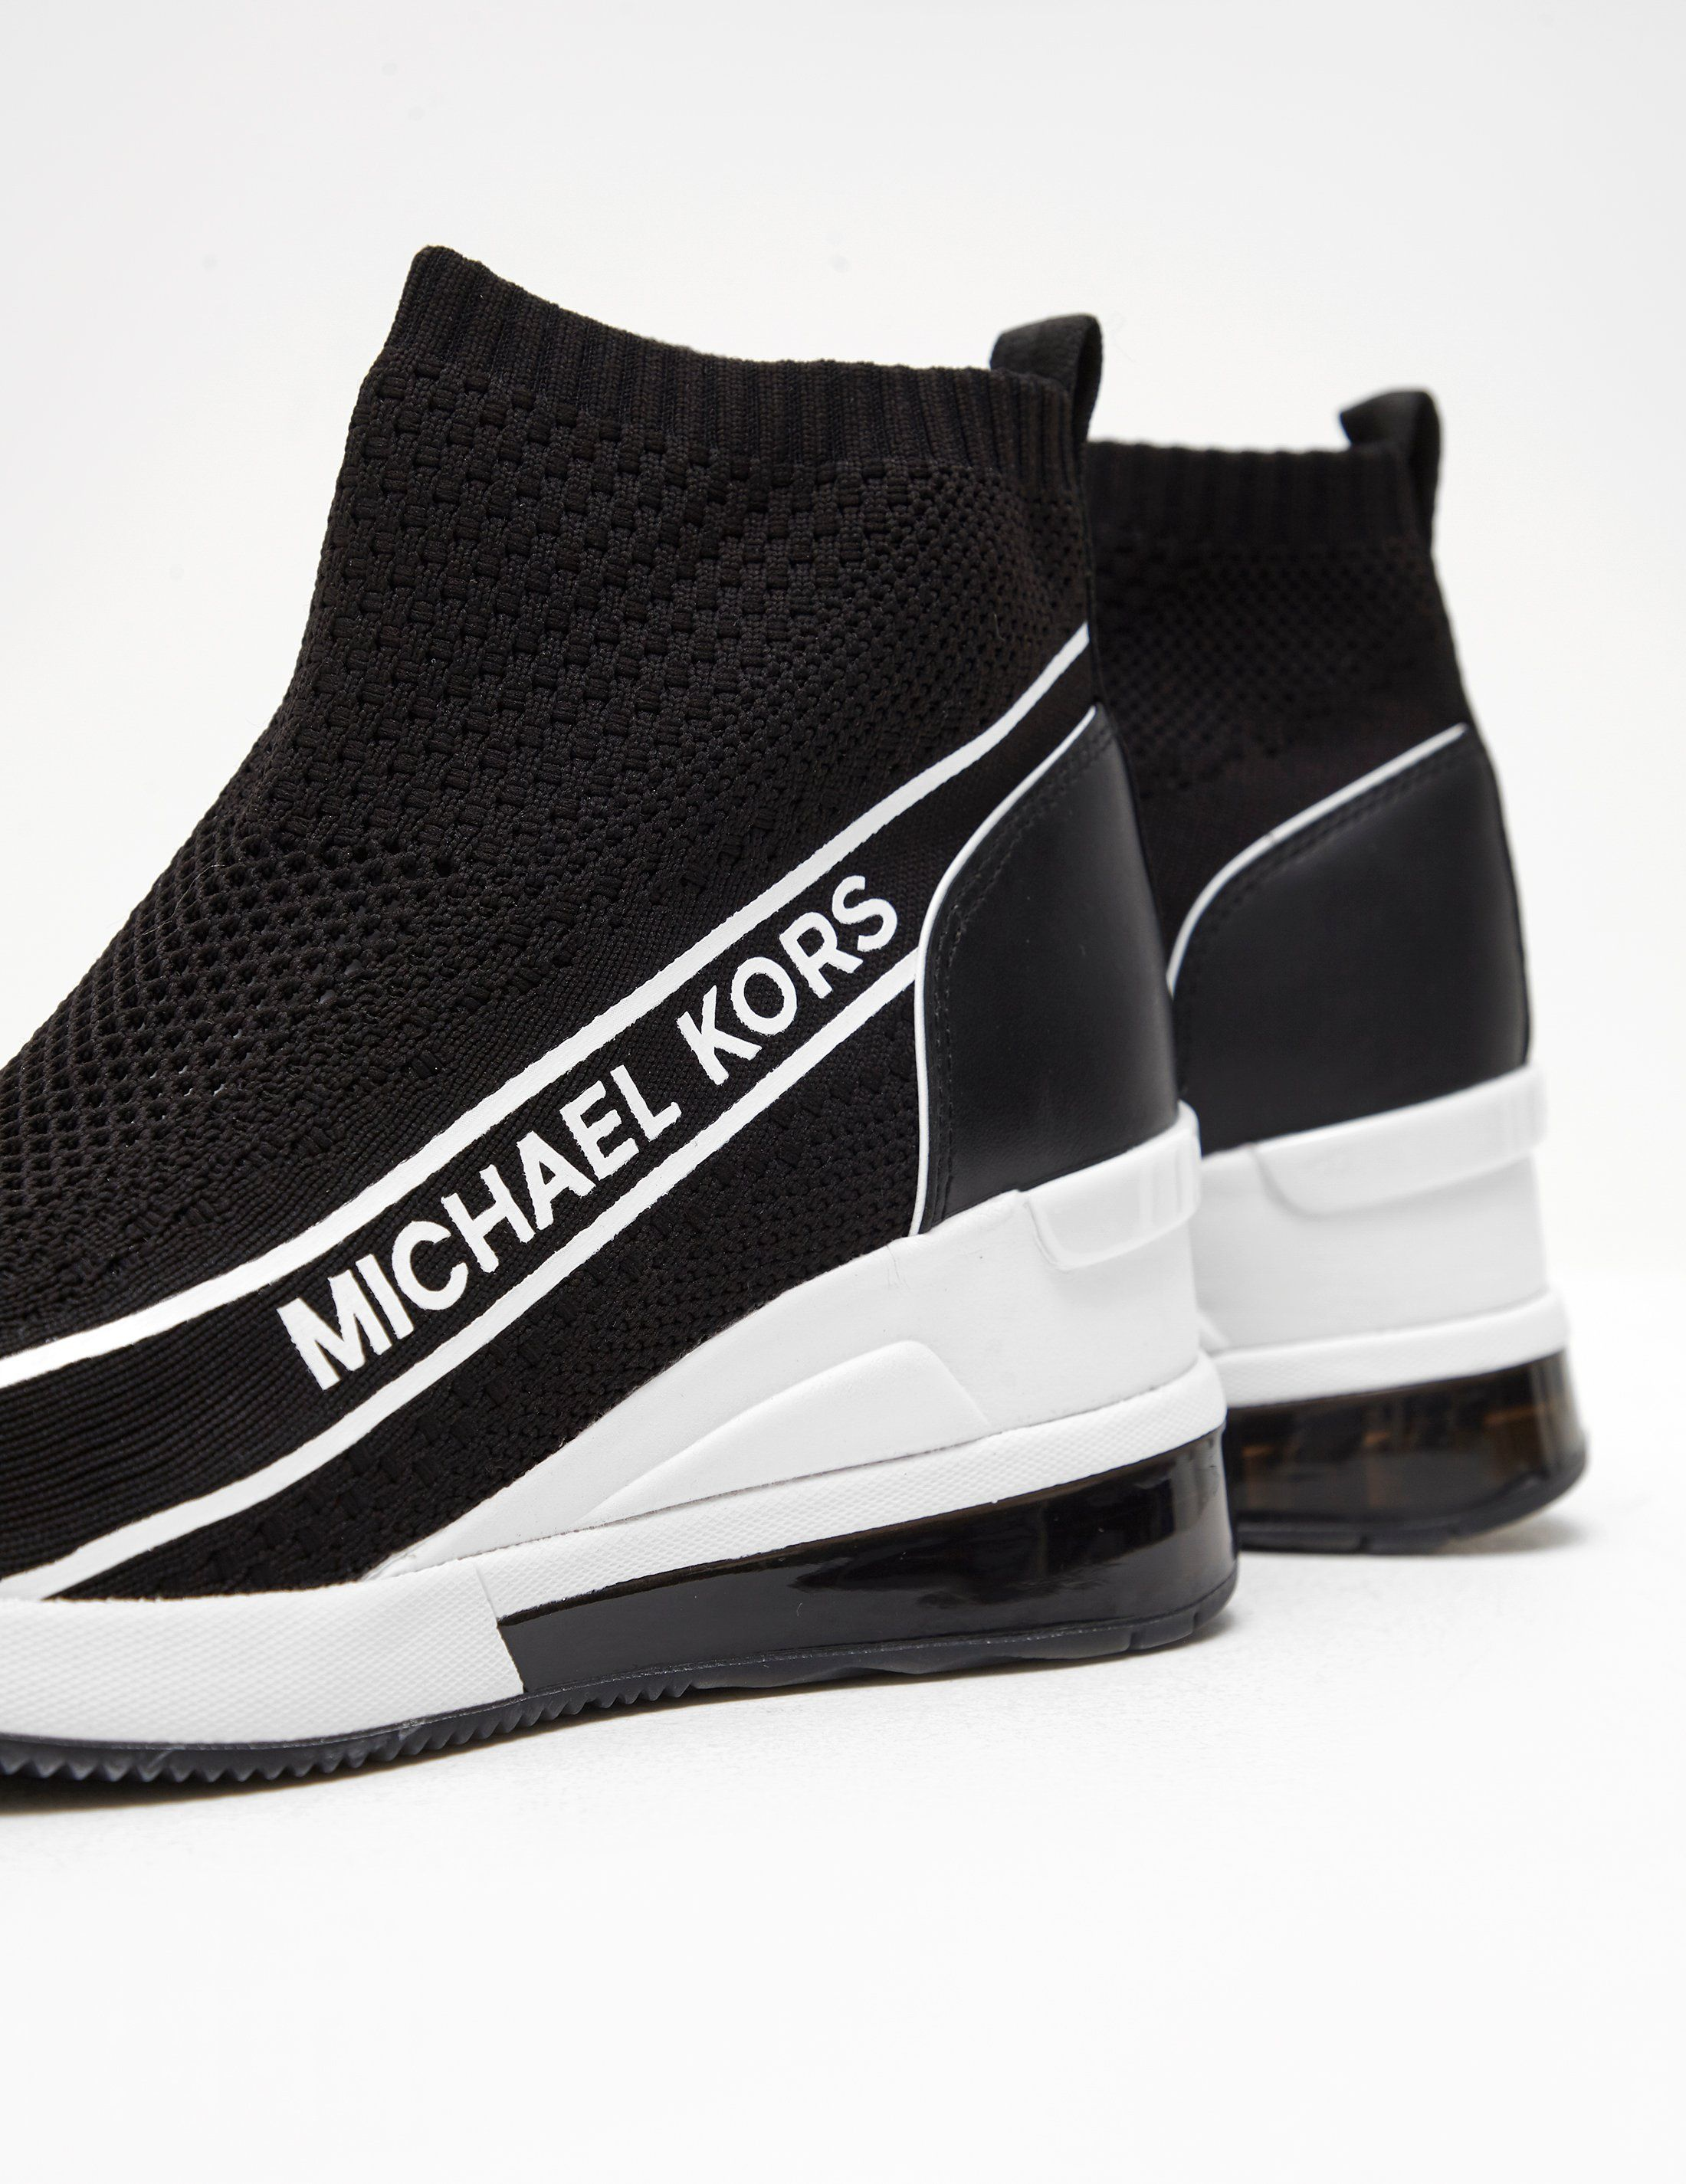 Michael Kors Skyler Bubble Boot